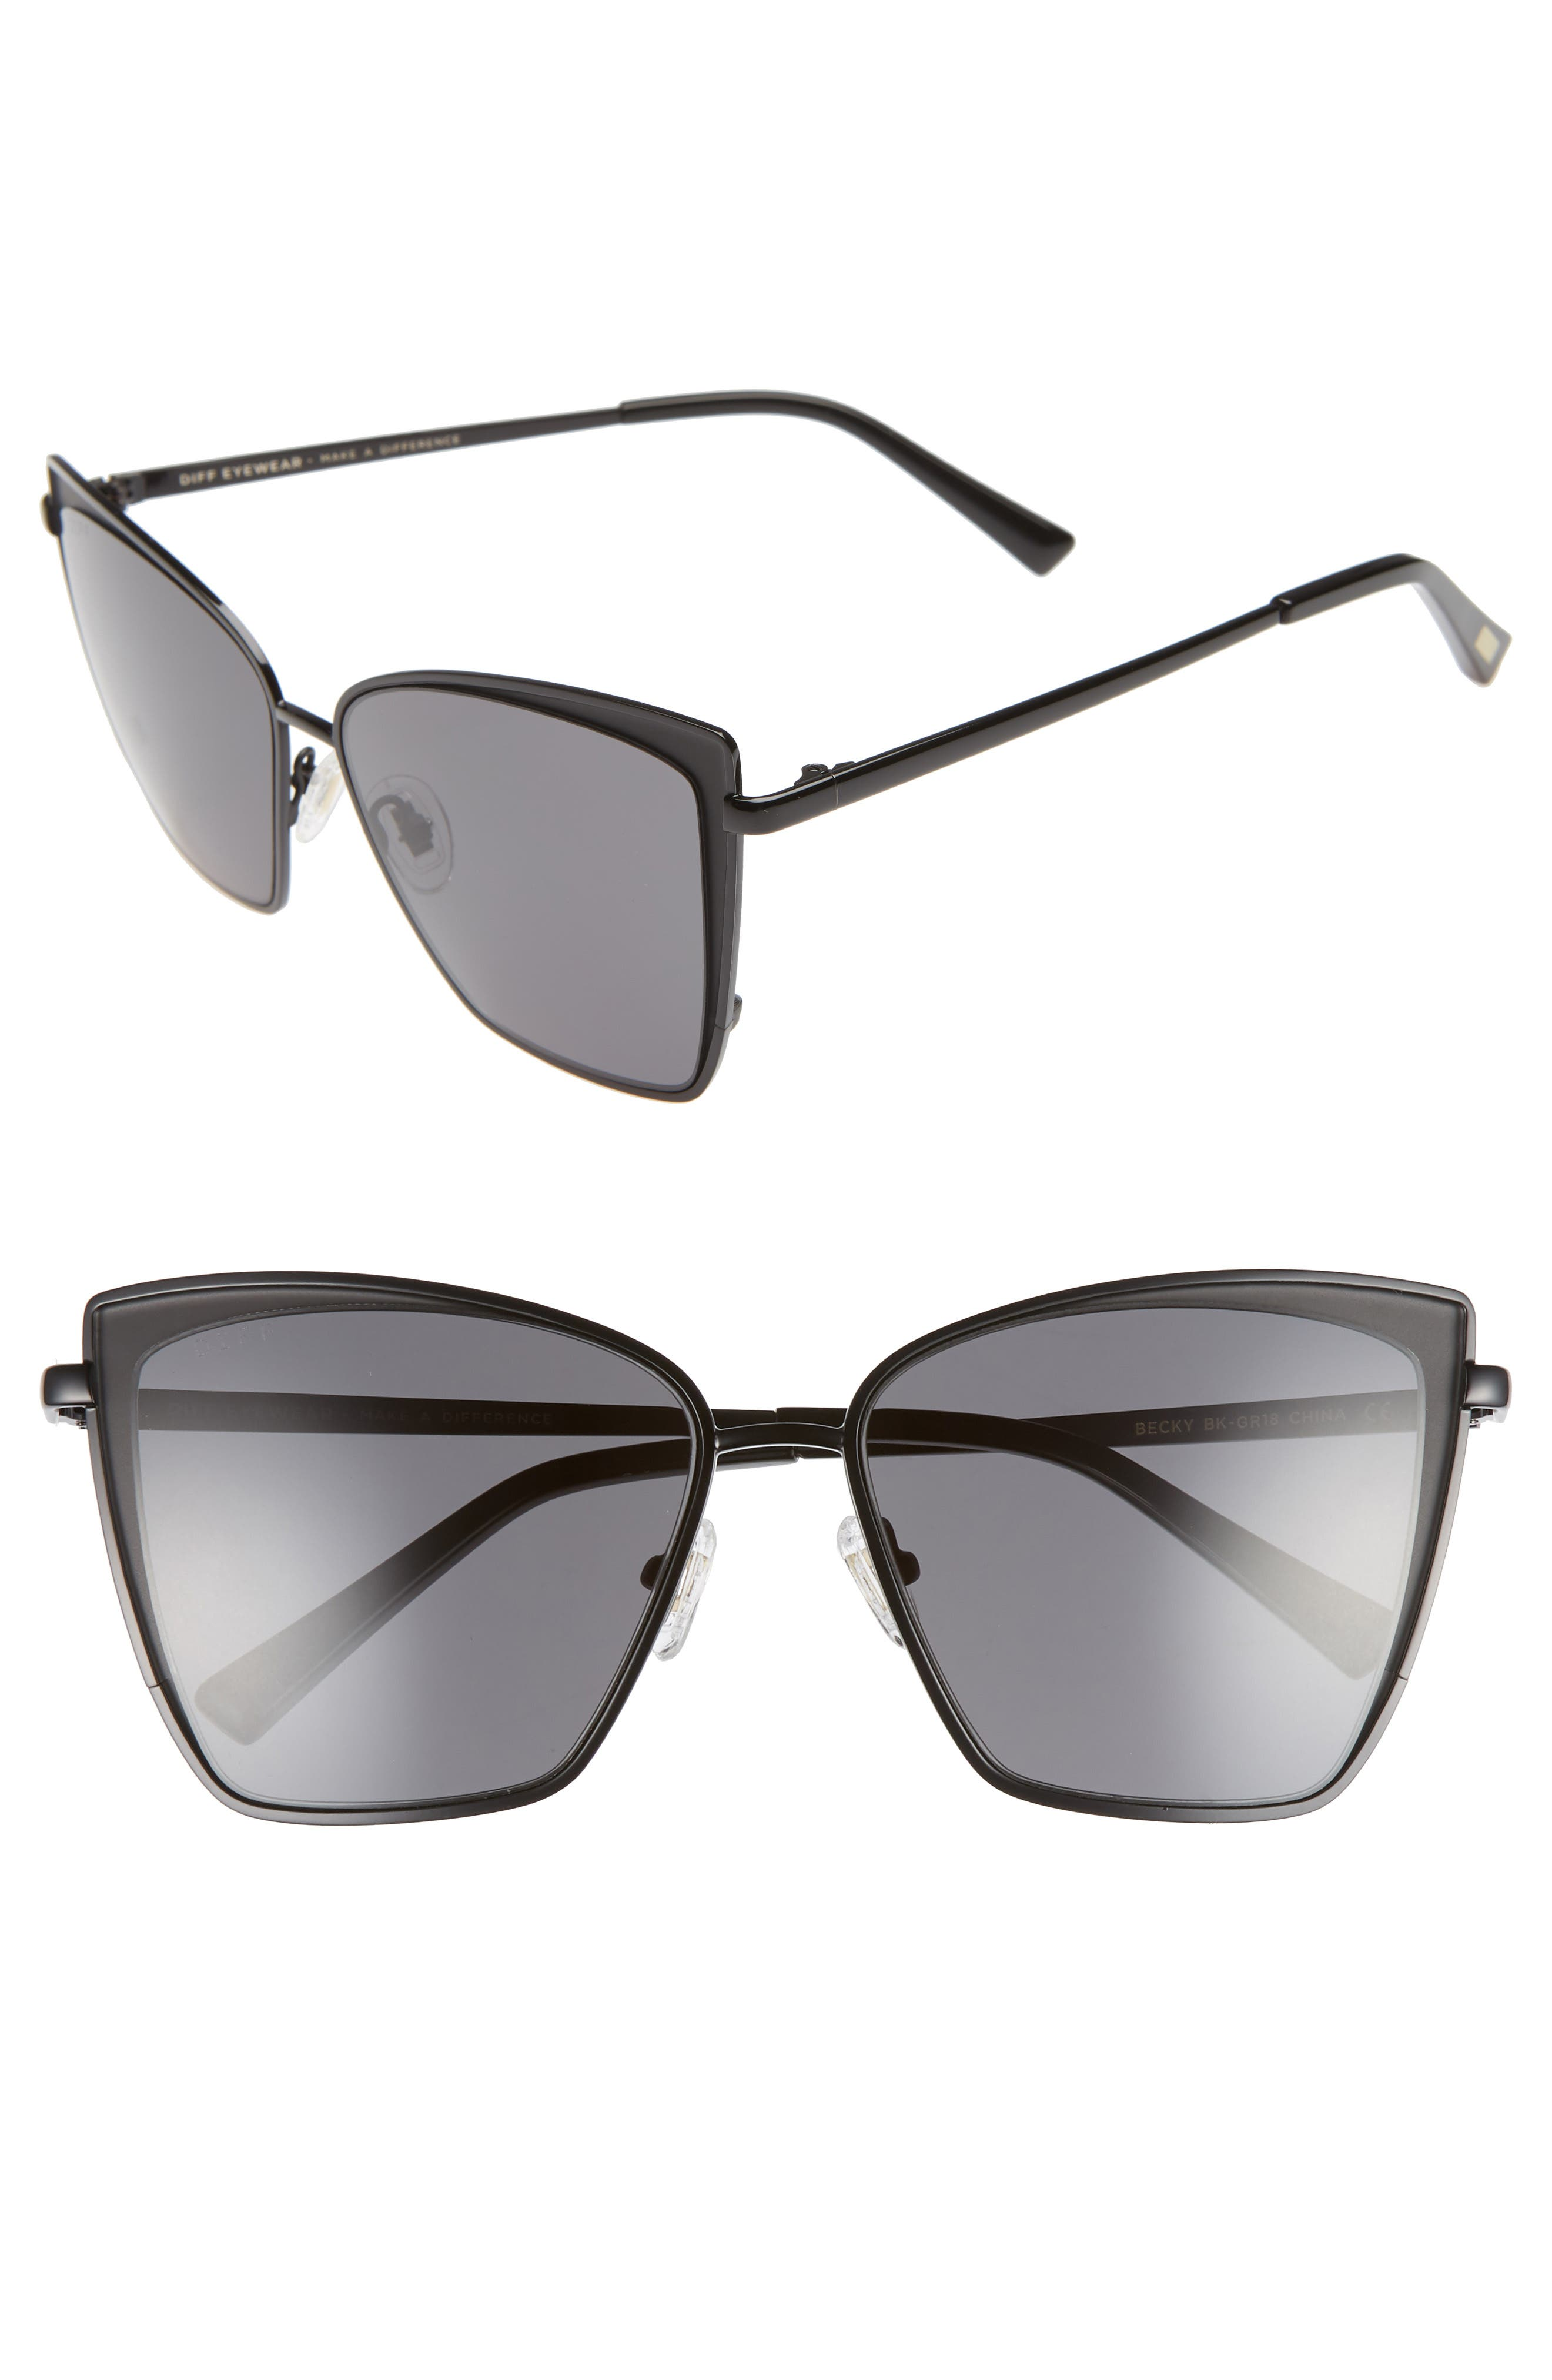 Becky 57mm Sunglasses,                             Main thumbnail 1, color,                             BLACK/ GREY